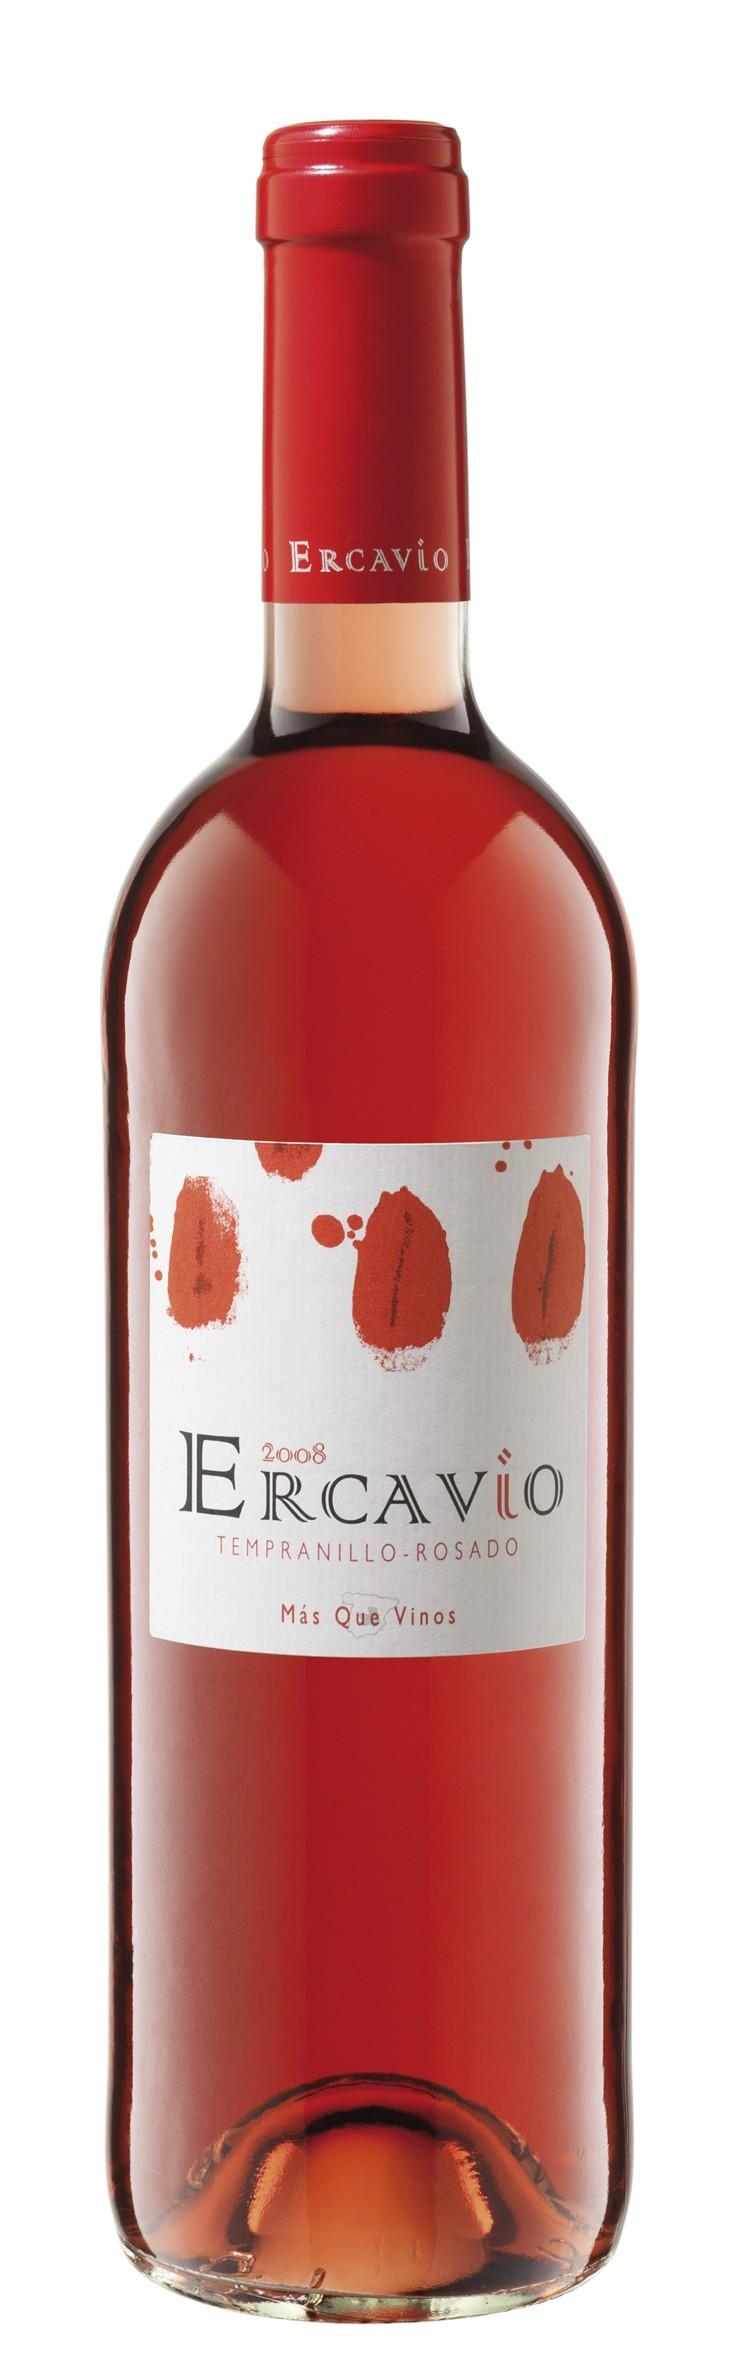 Related Image Wine Bottle Rose Wine Bottle Wines